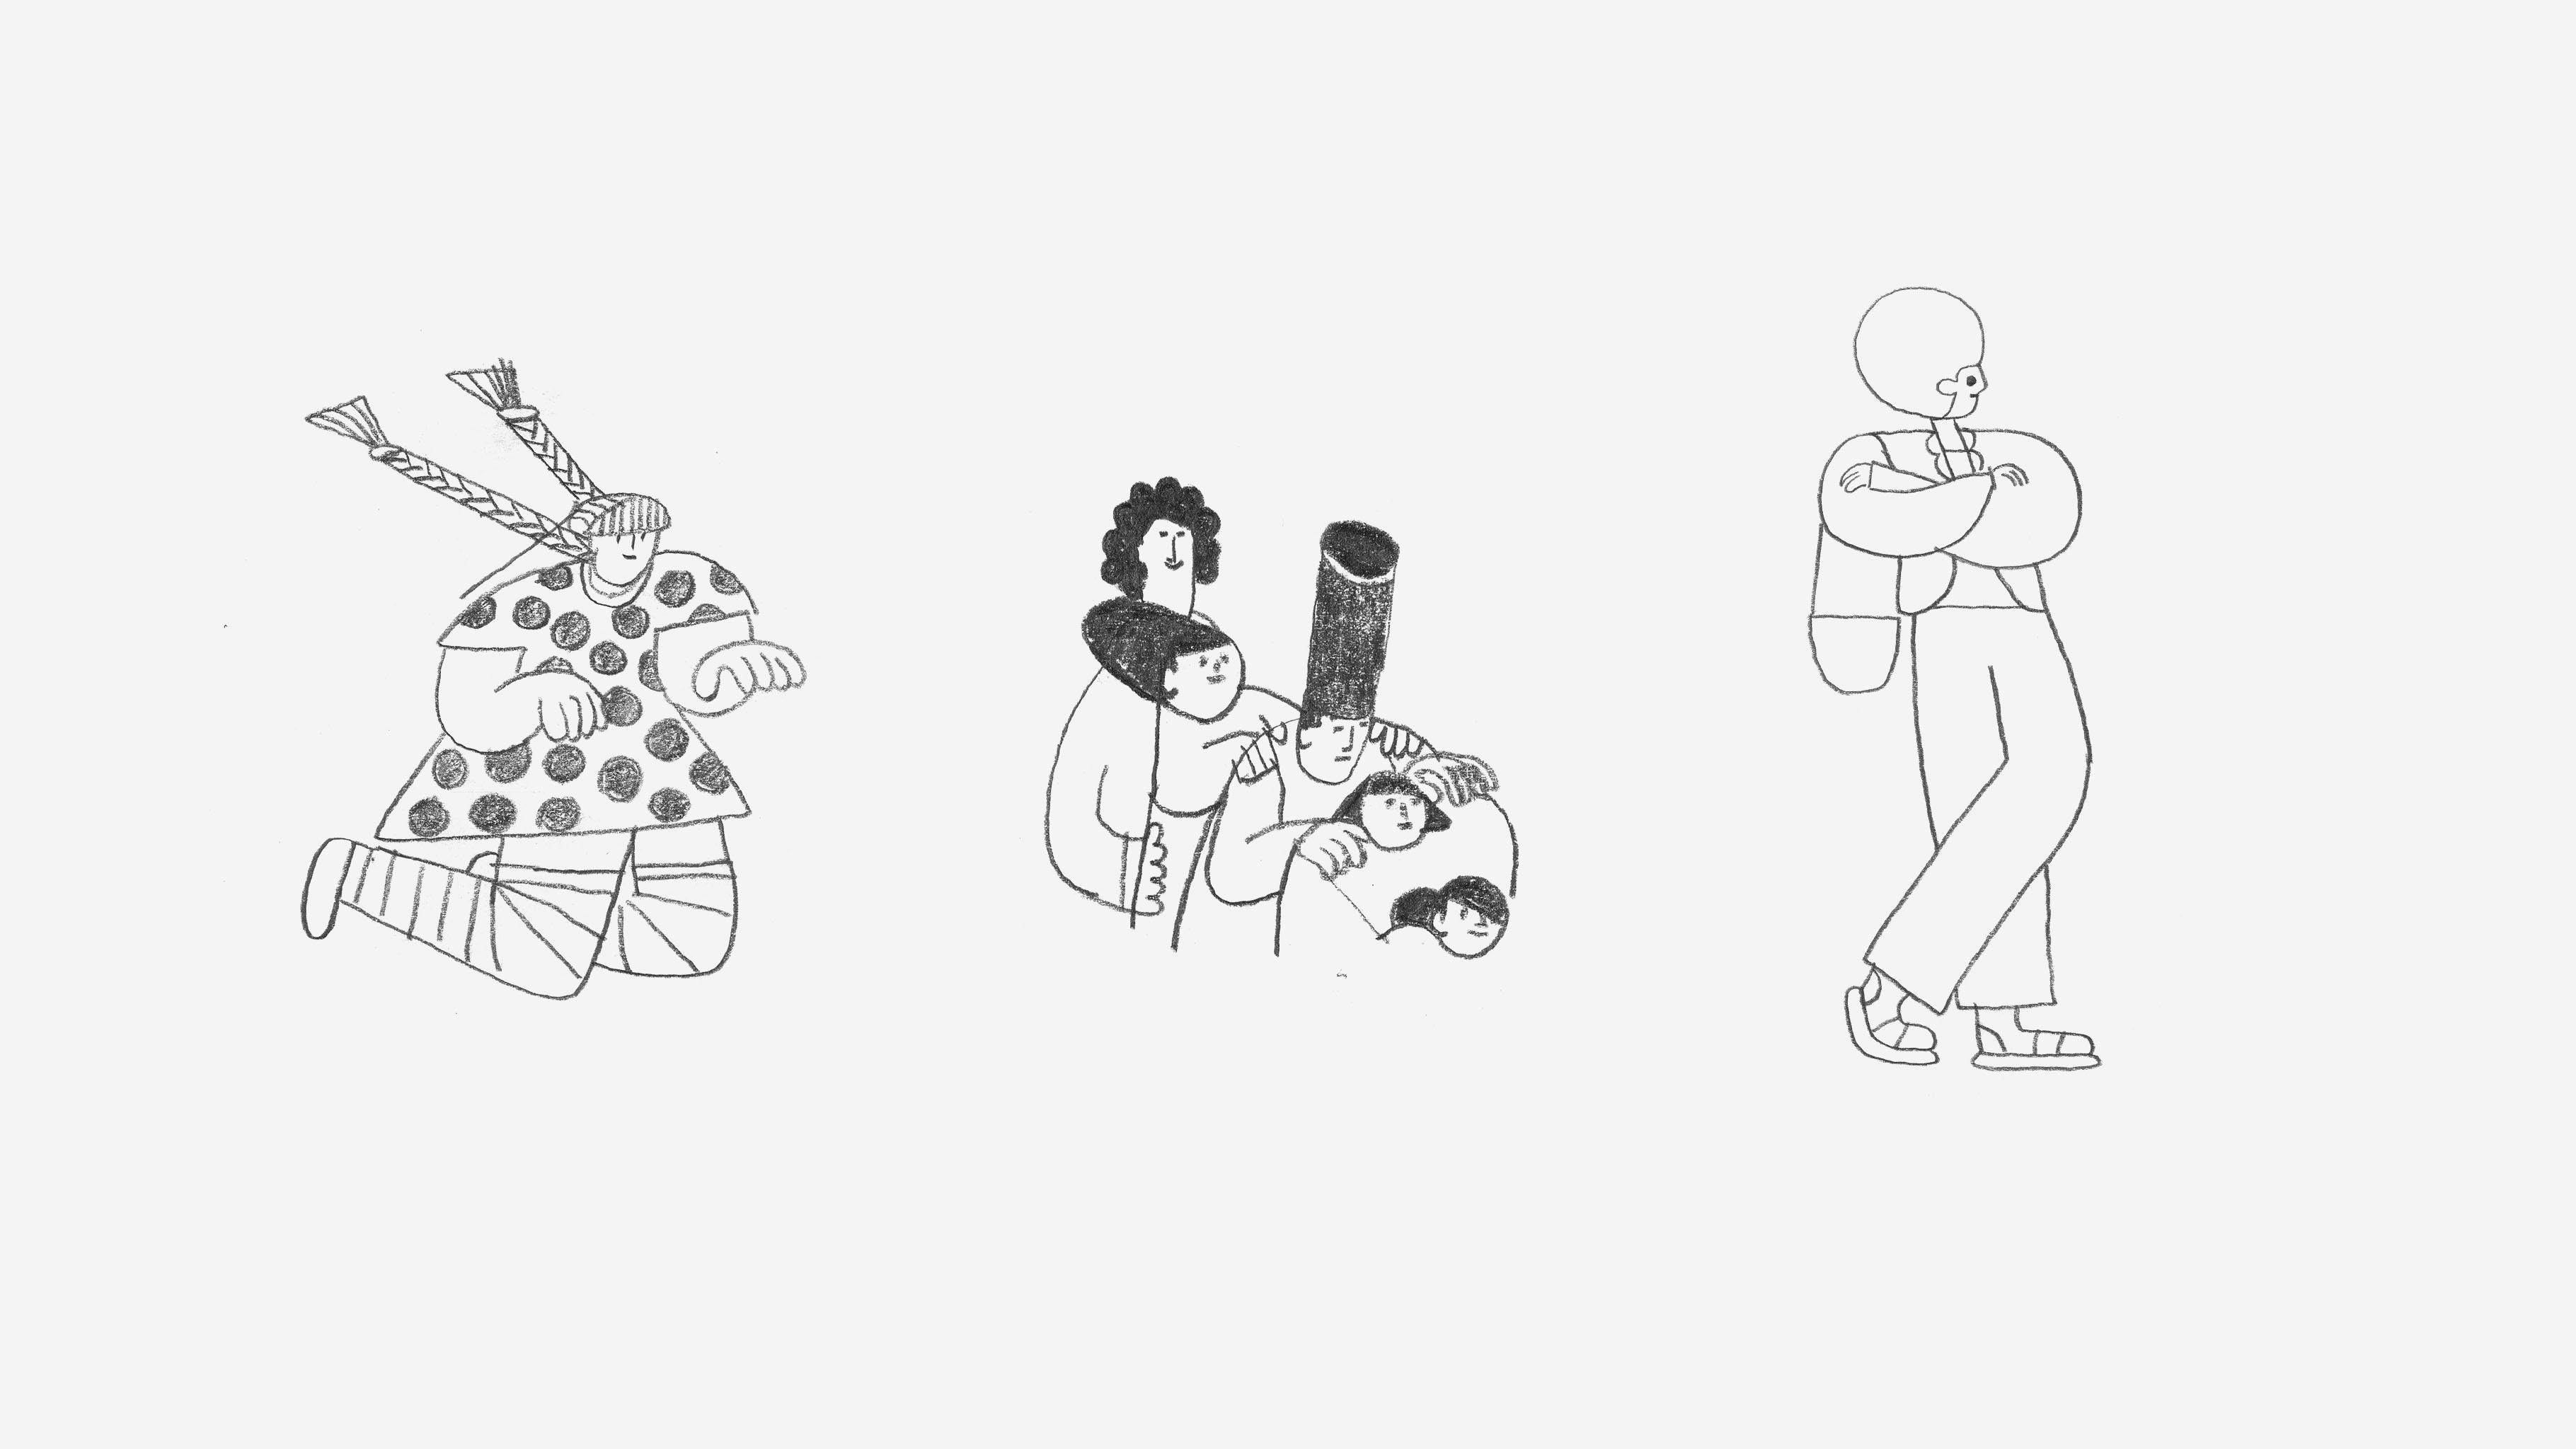 Facebook Groups James Graham Sketches Storyboards 06